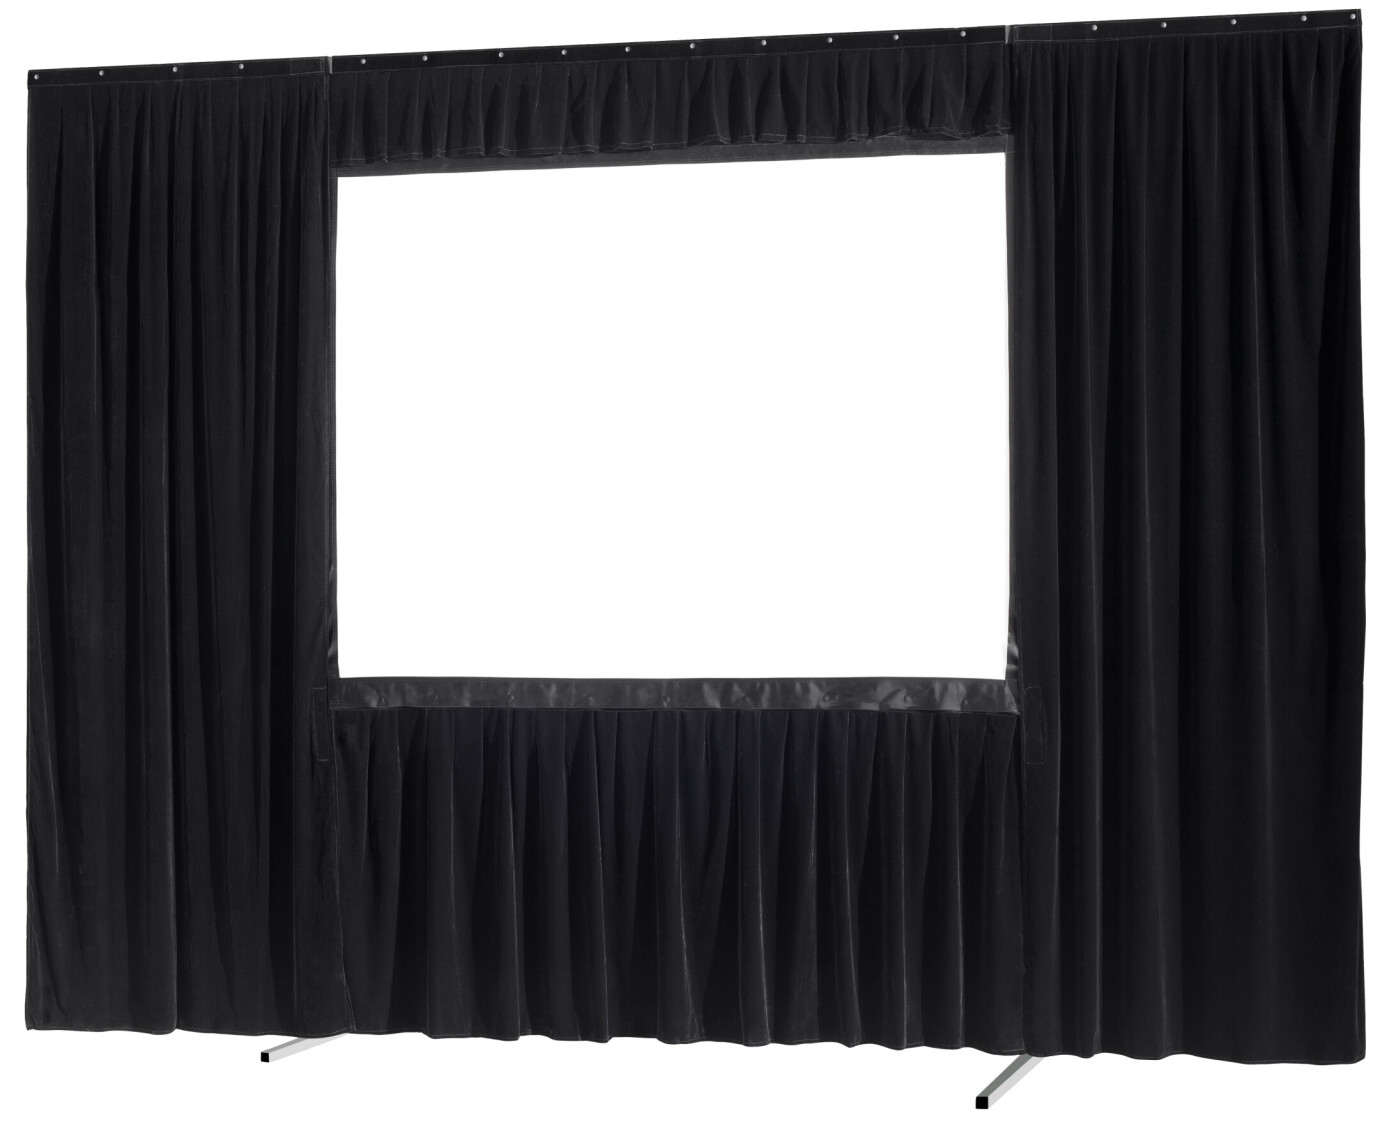 celexon 4-Piece Drape Surround for Folding Frame Mobile Expert - 244 x 137cm